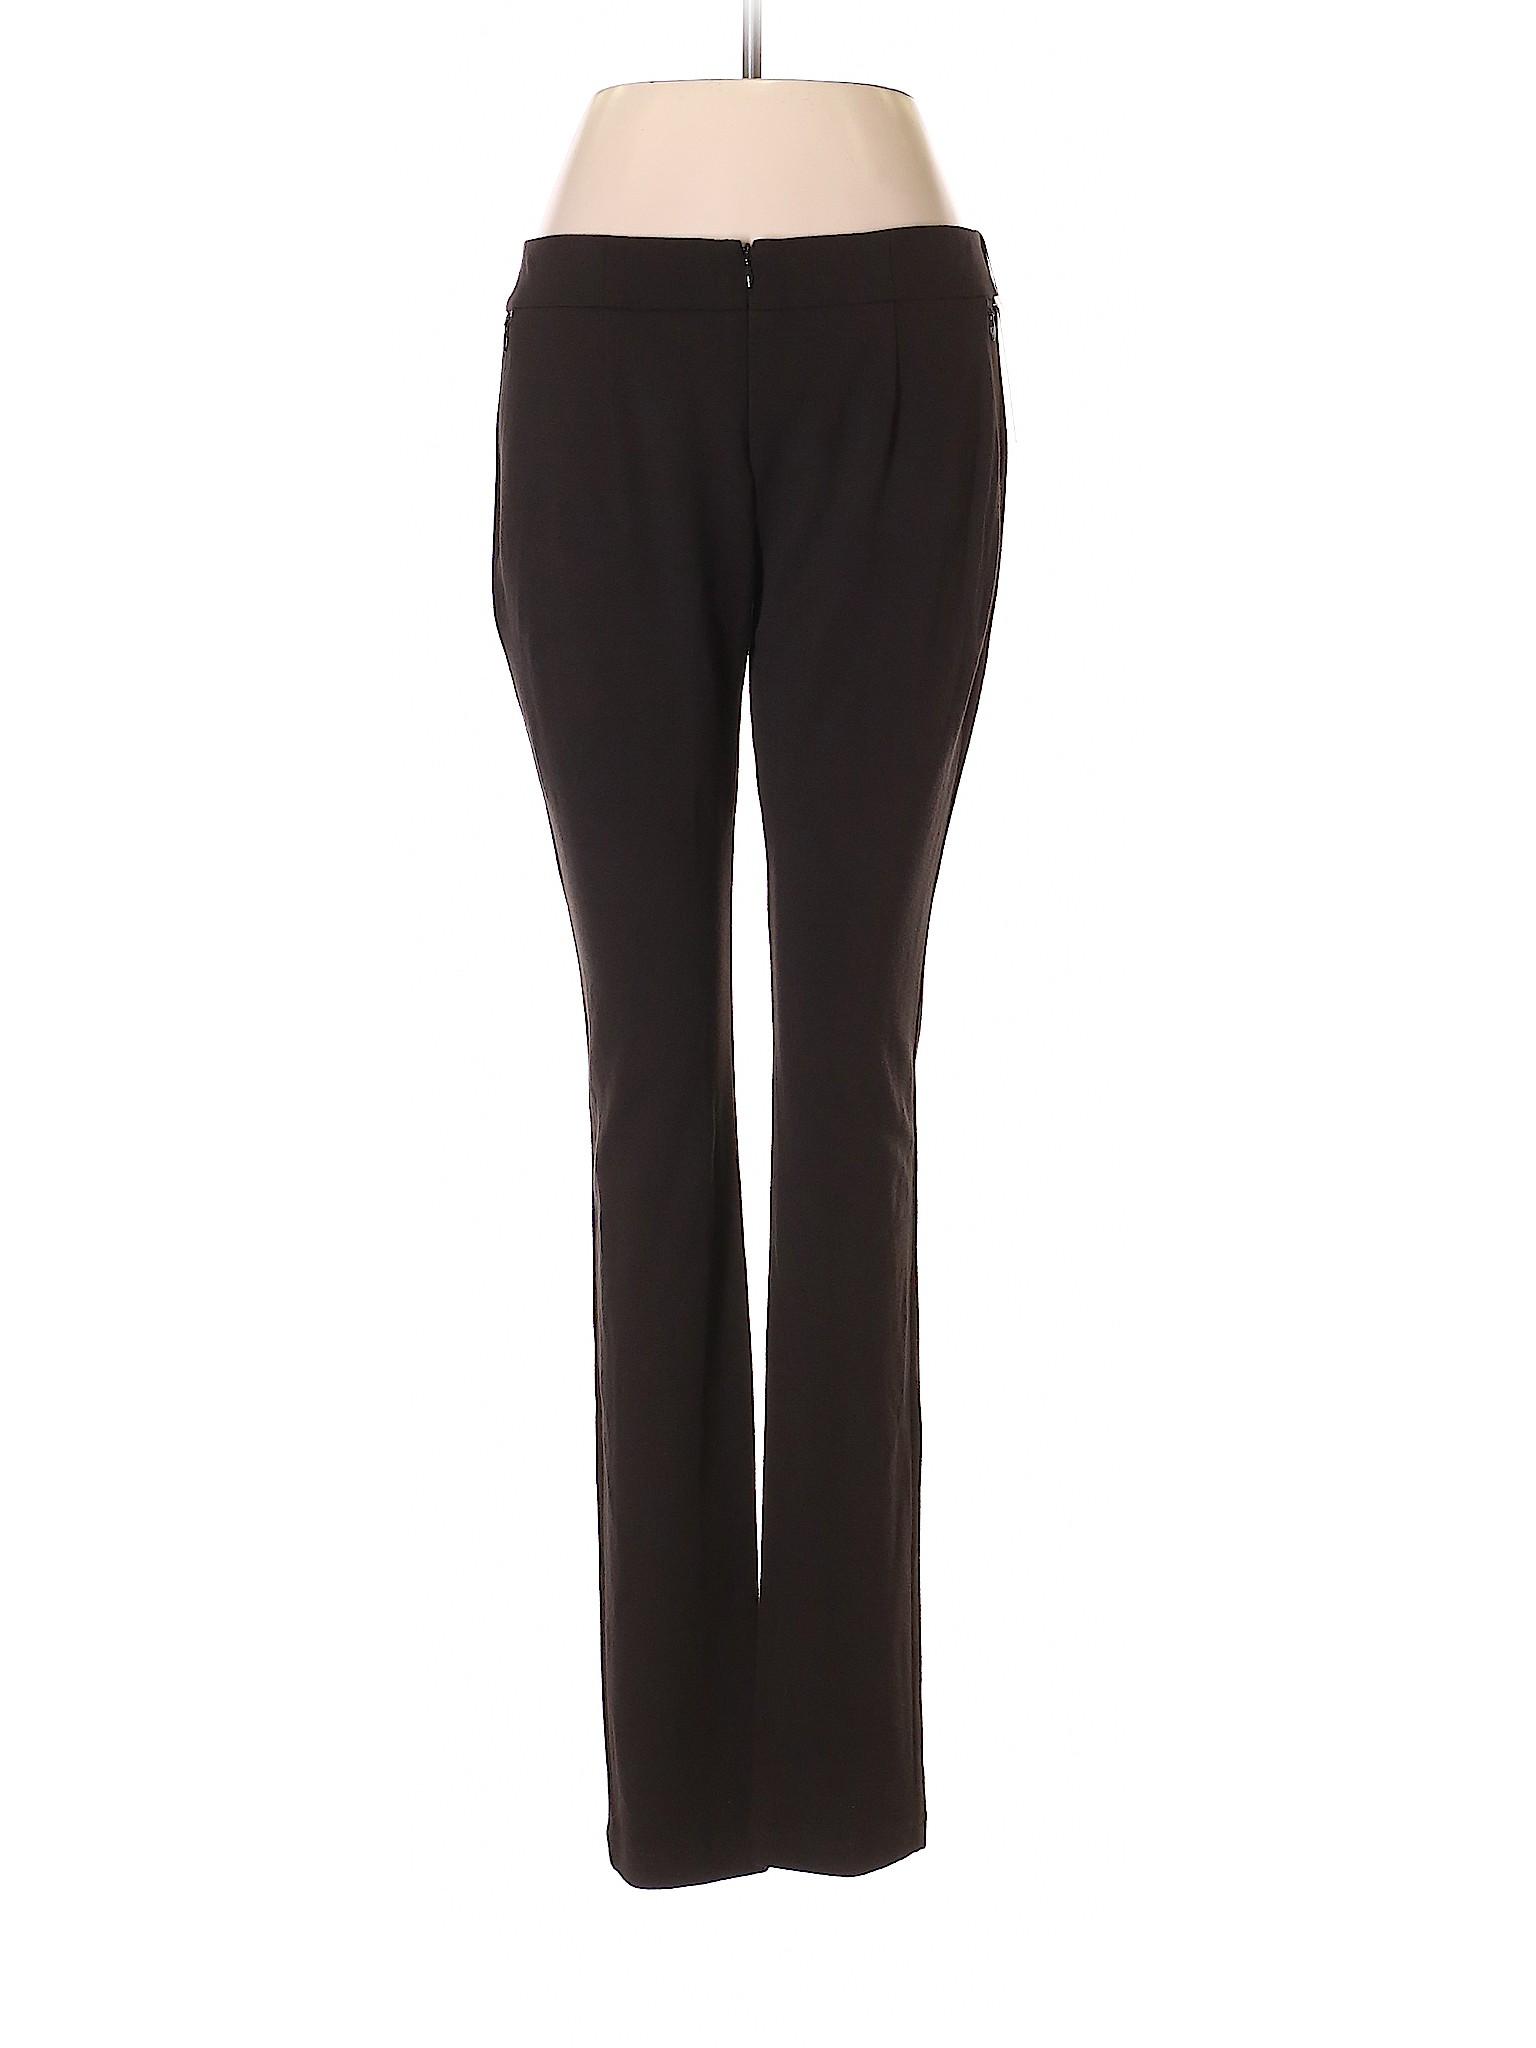 NWT Worth ny York kvinnor bspringaa Dress Pants 4